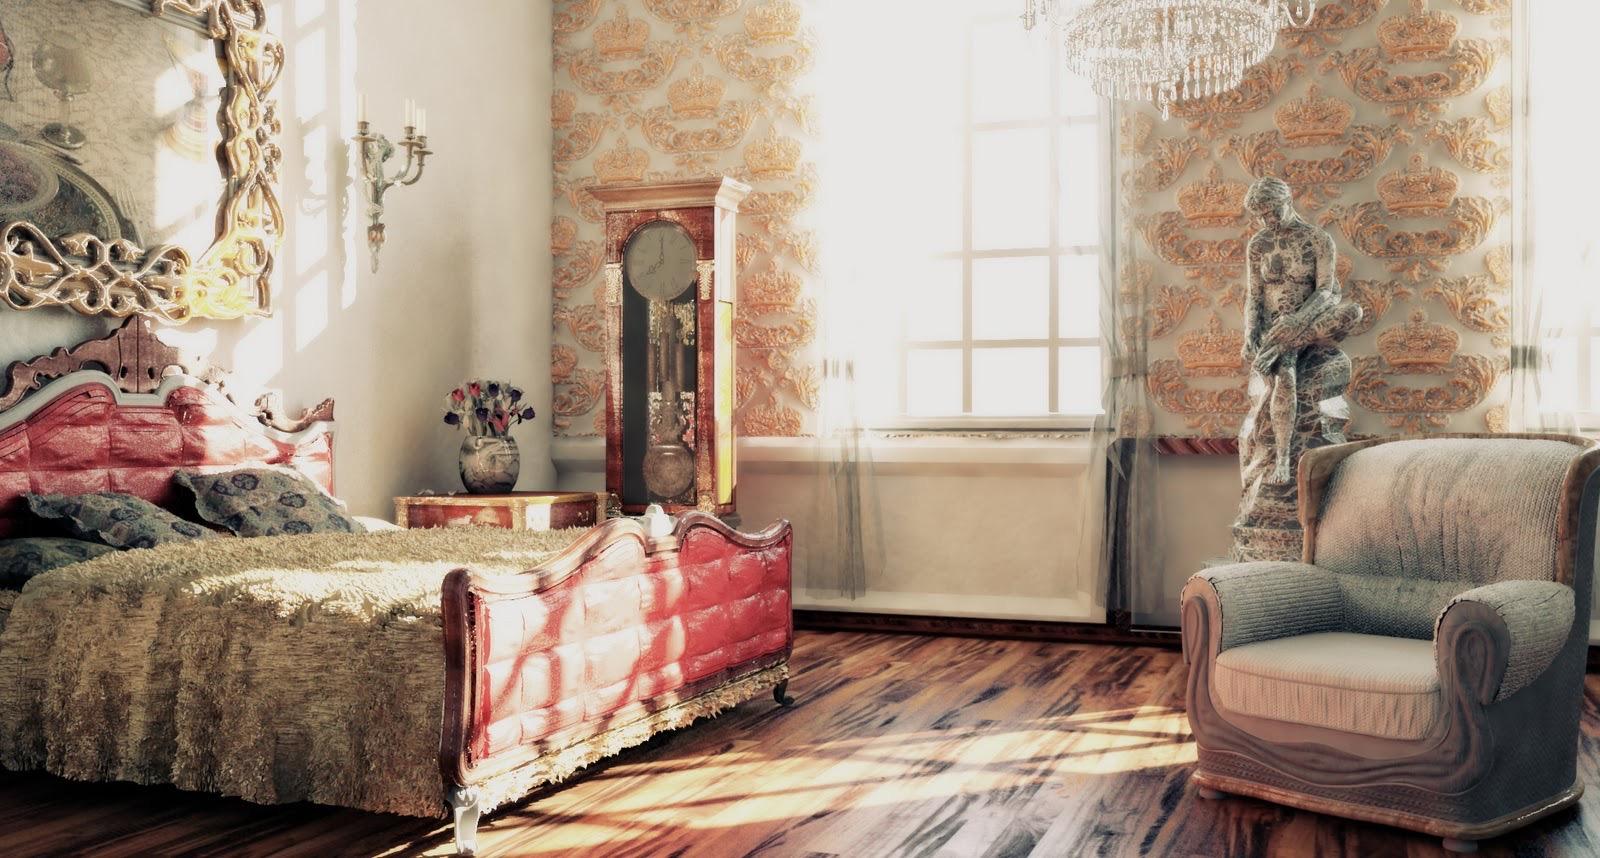 Victorian Decor Ideas Comfortable Bedroom (View 16 of 19)